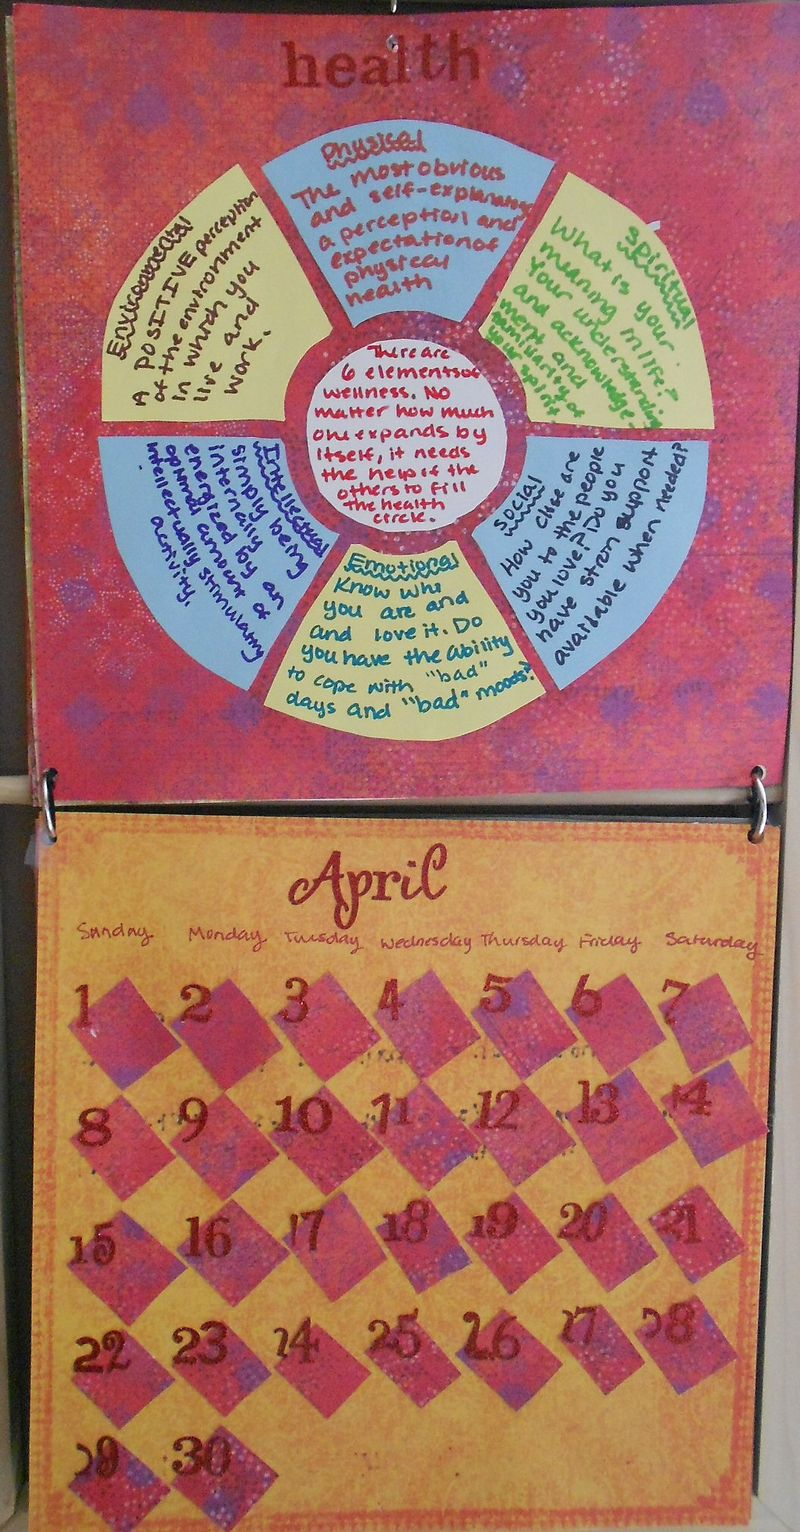 Thrive_april